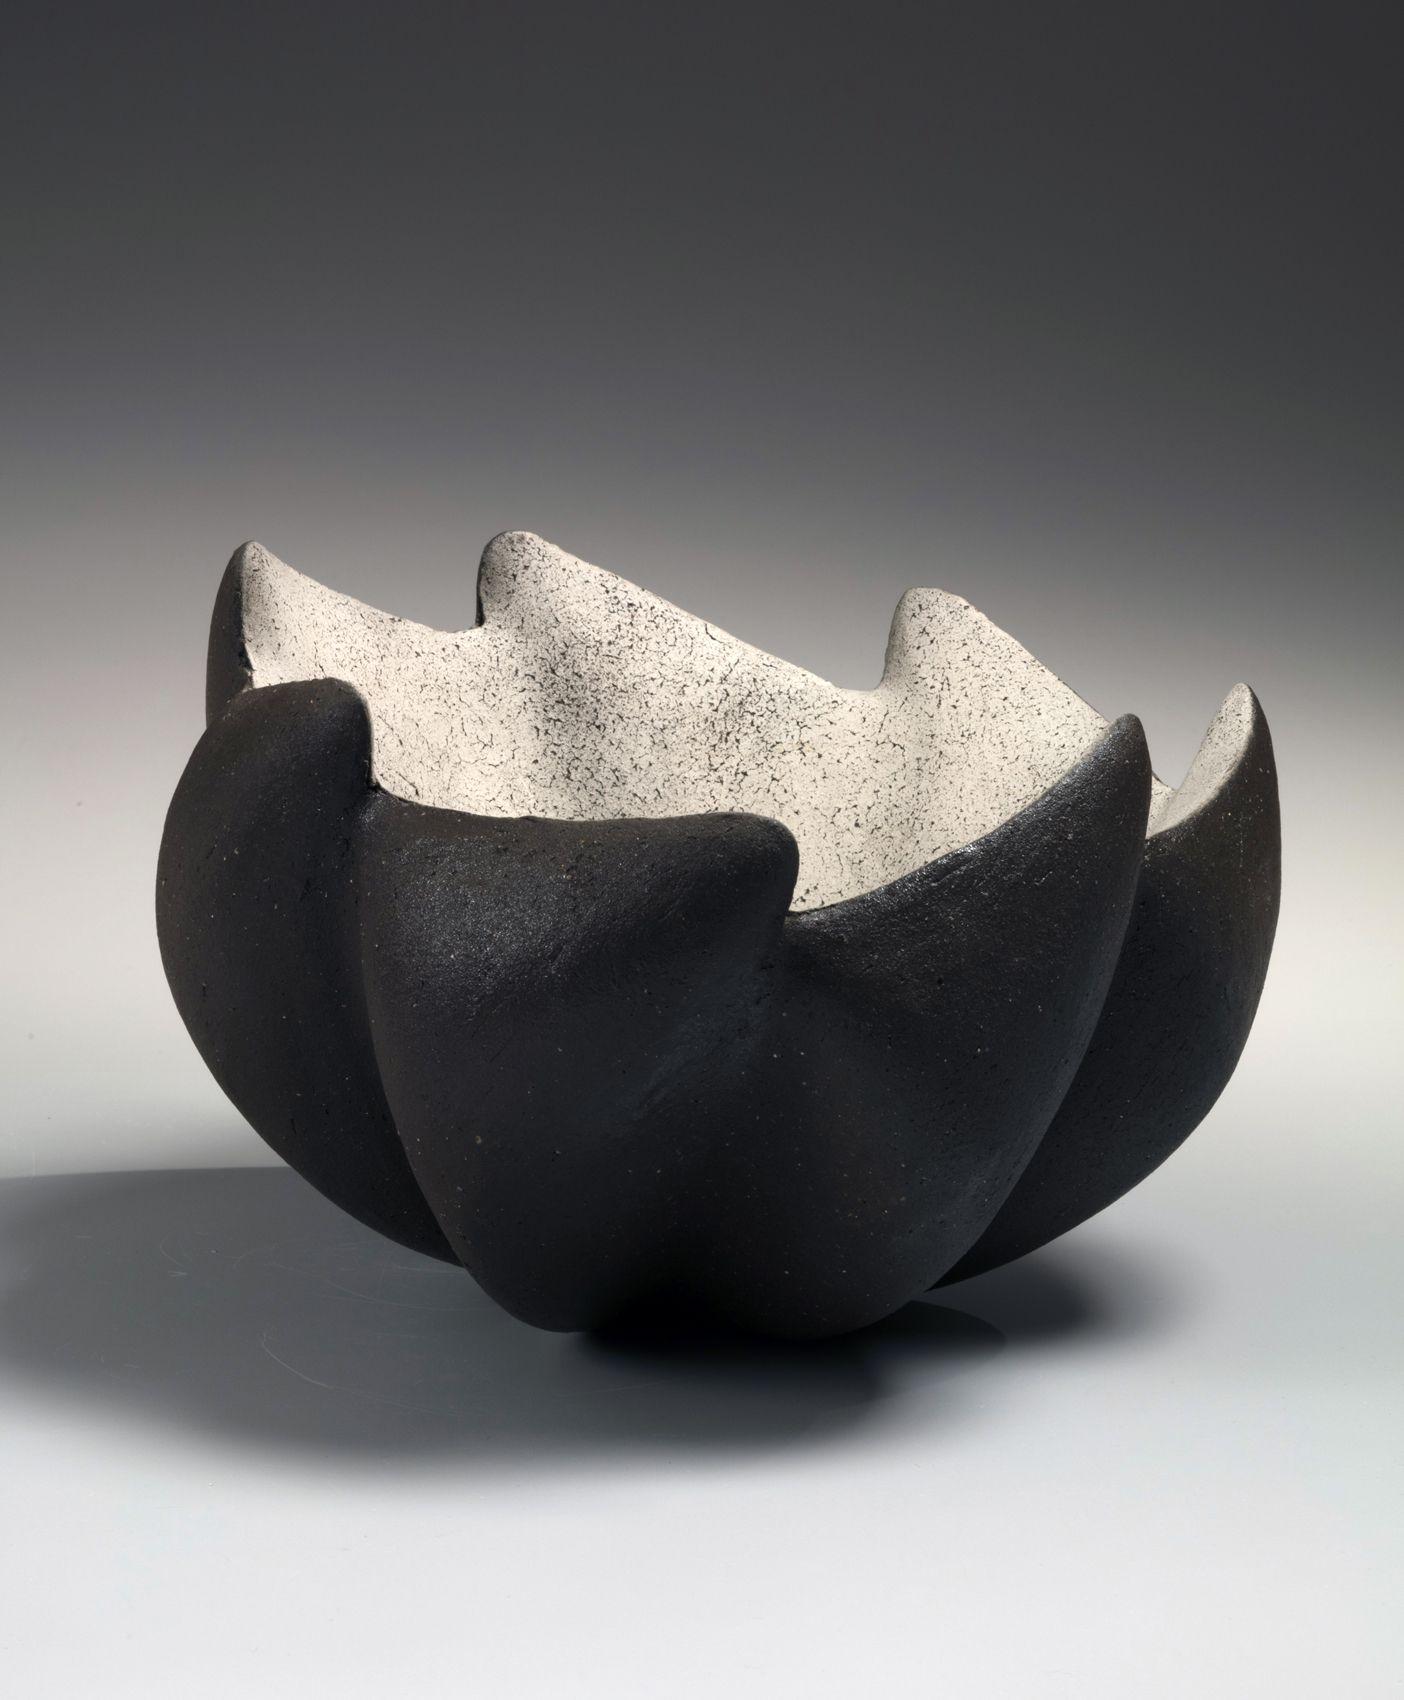 Ichino Masahiko (b. 1961), Lobed bowl with rising wave-like mouth